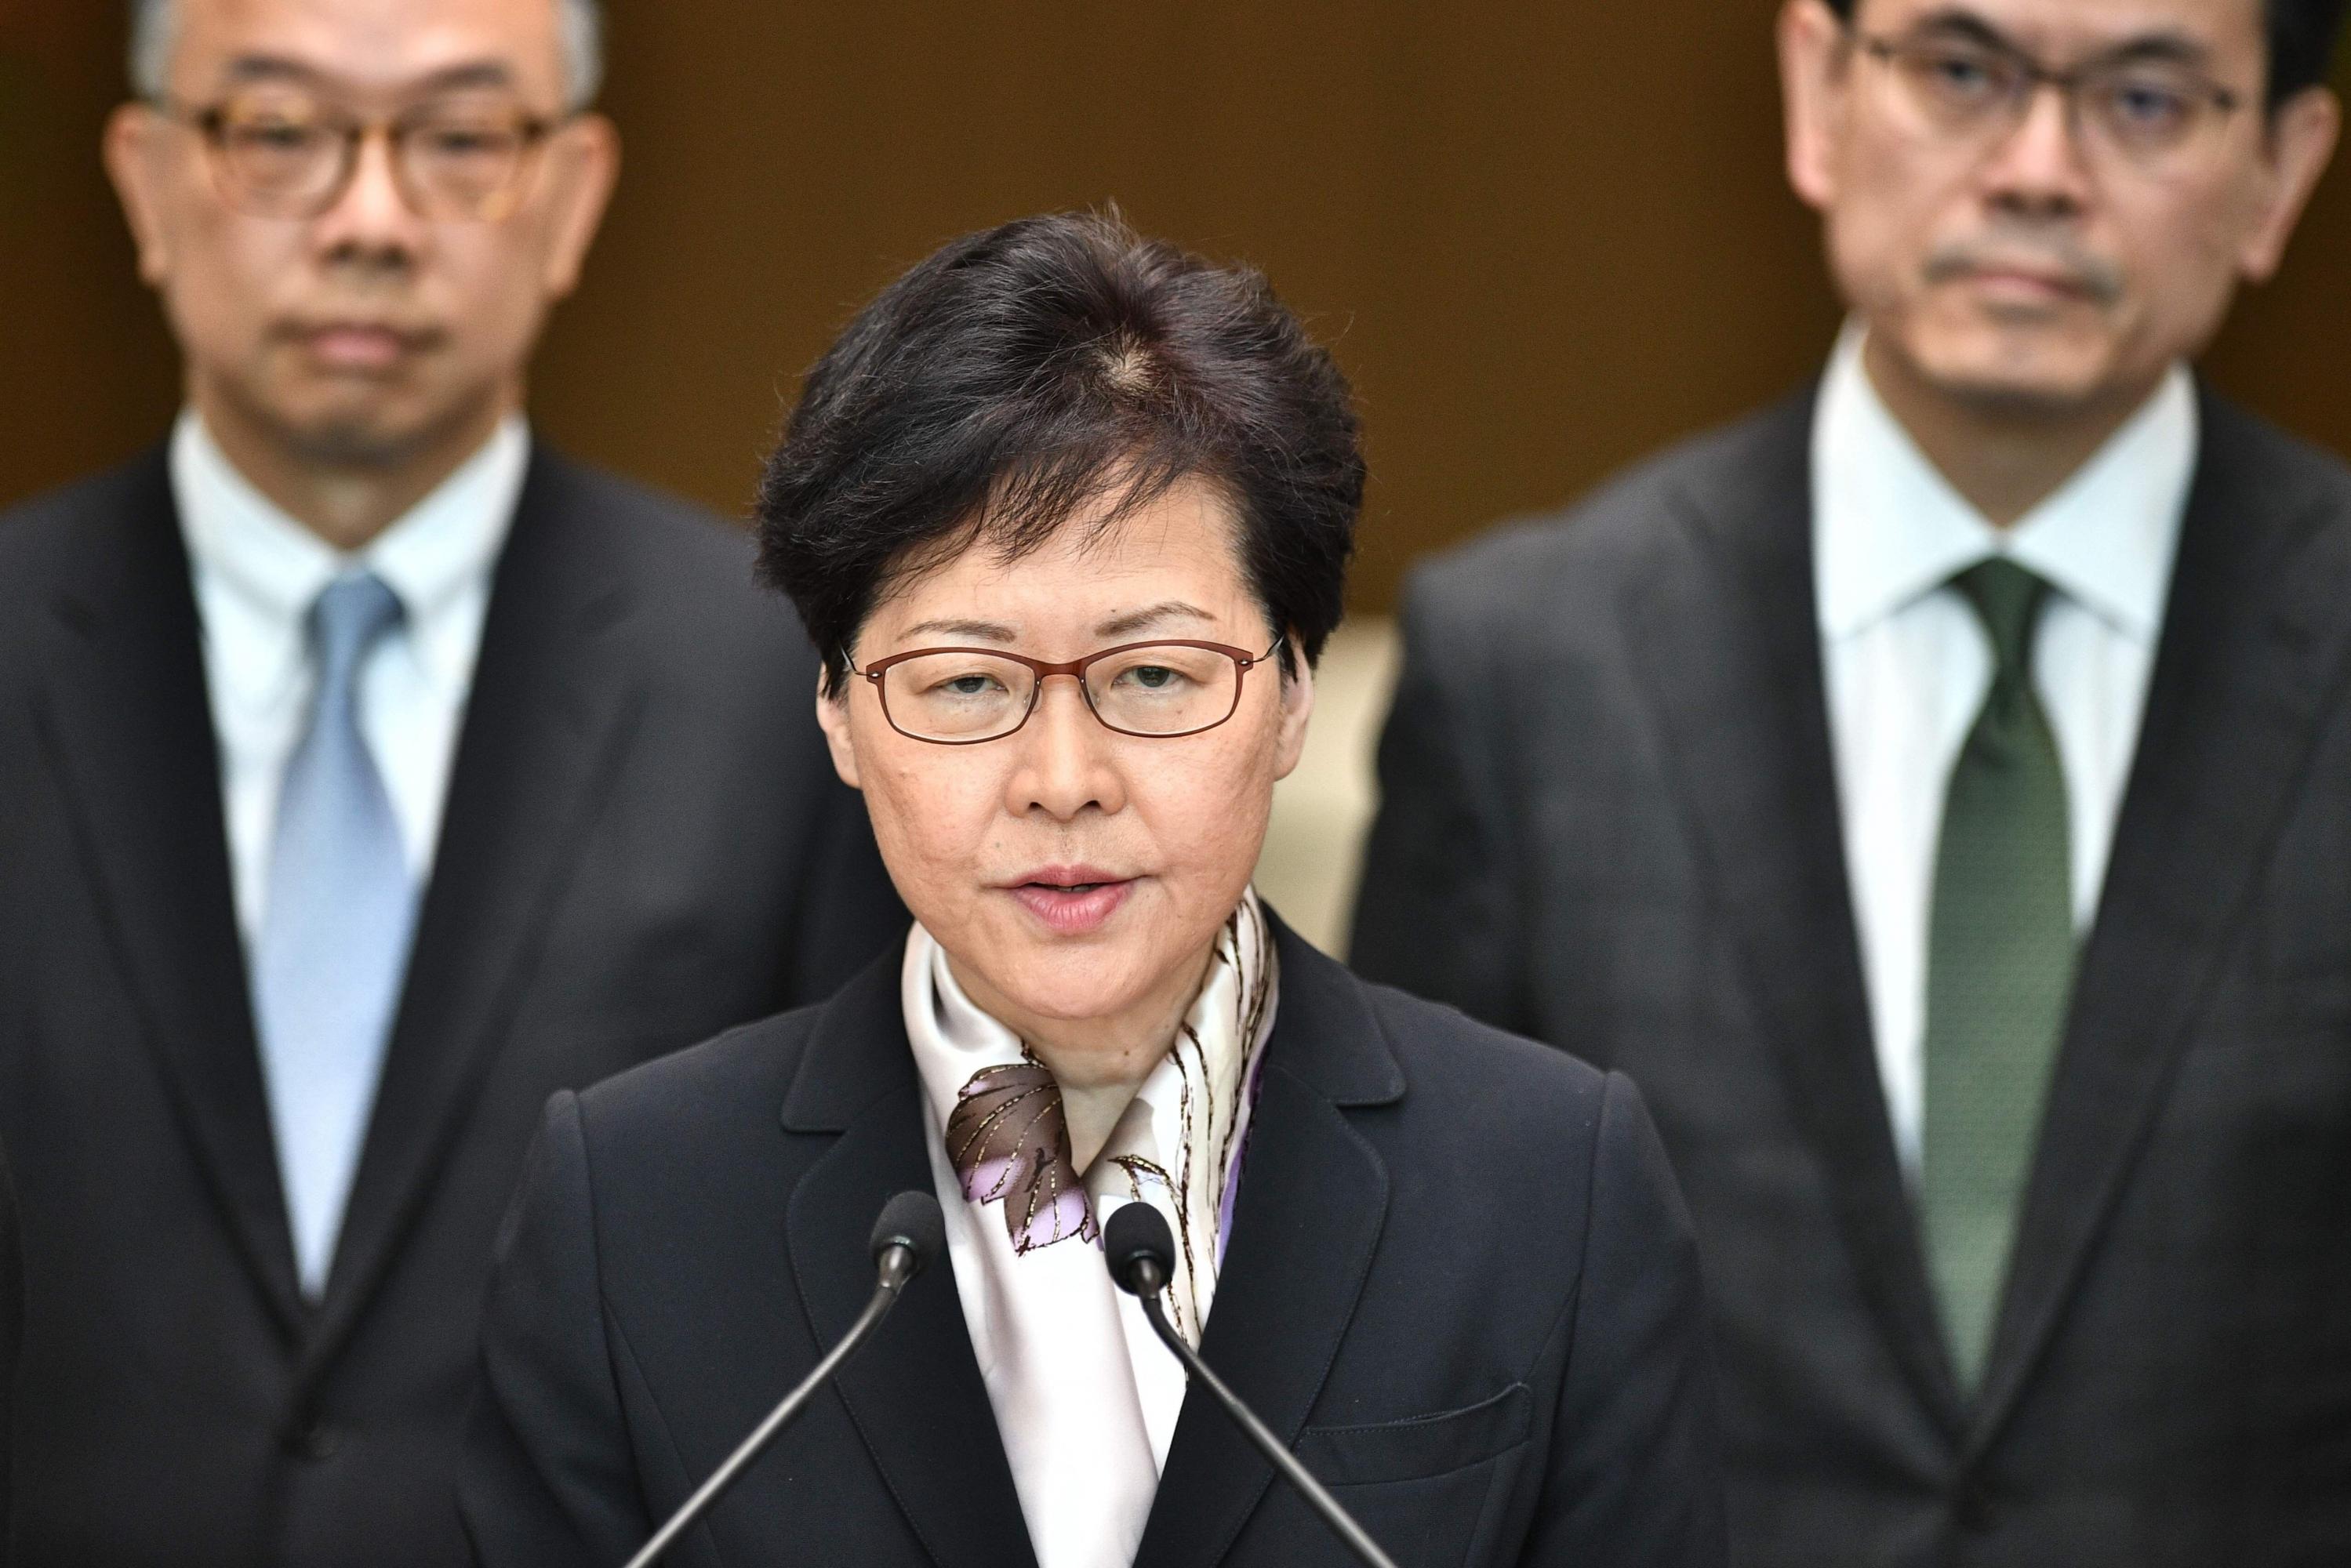 En la imagen, la jefa de gobierno de Hong Kong Carrie Lam. (Foto: AFP)